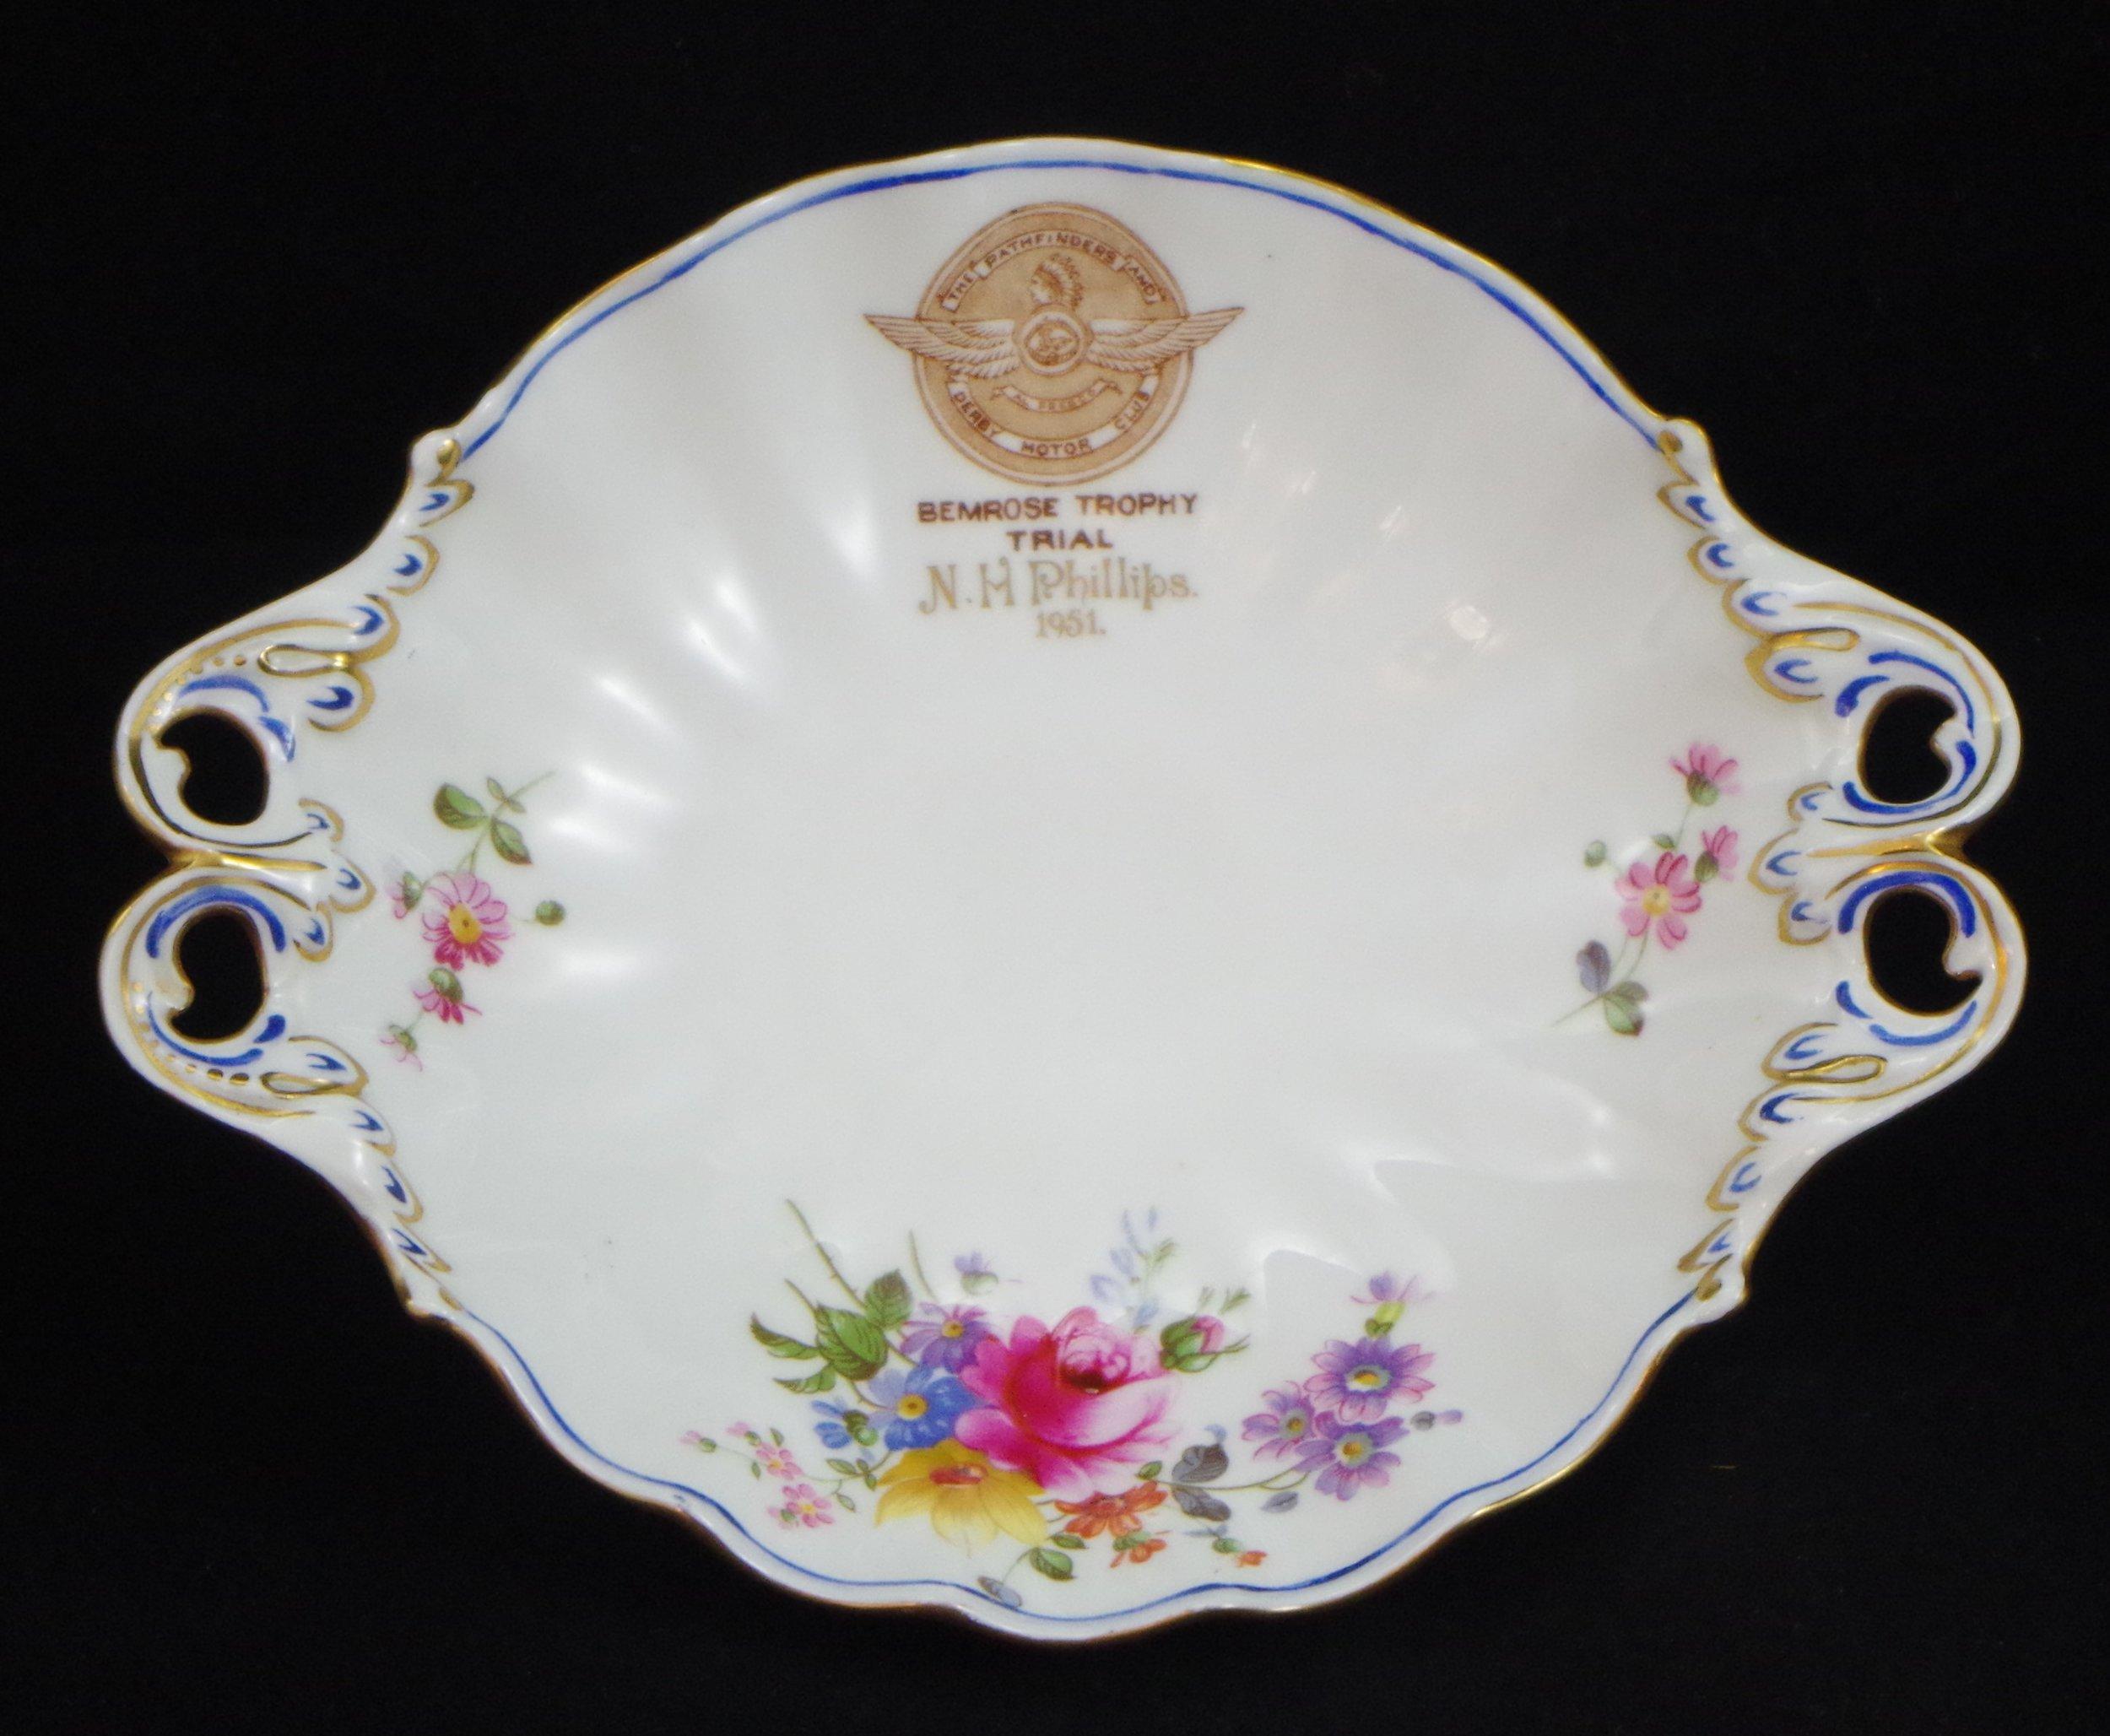 royal-crown-derby-duchess-tray-bemrose-trophy-trial-n-h-phillips-1951-9875